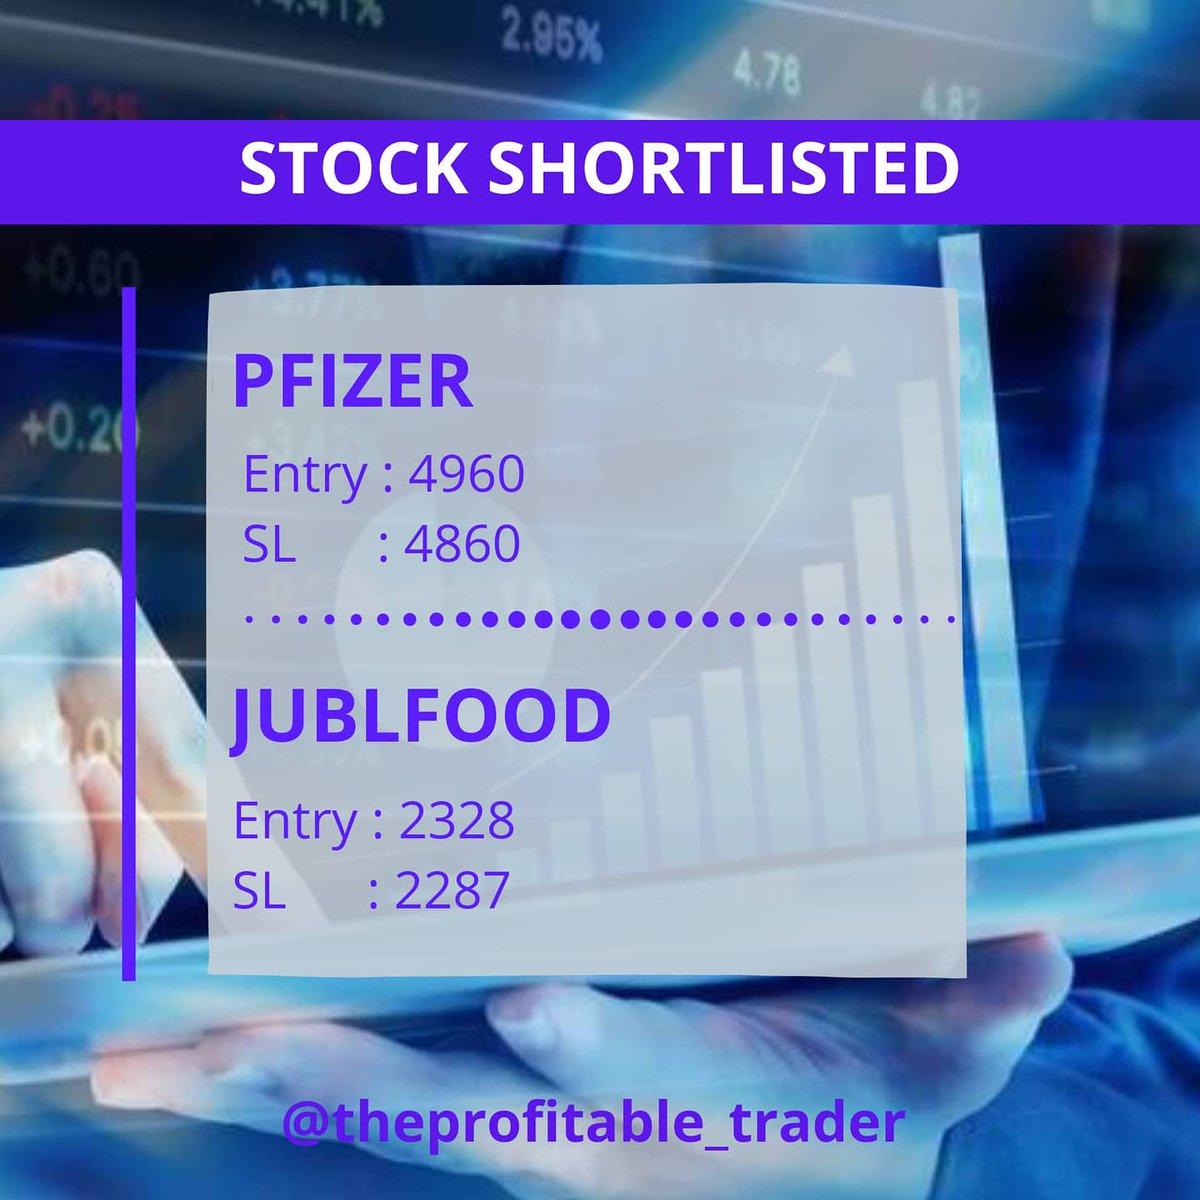 Stocks Shortlist for today, based on market opening will take position.   1. NAUKRI 2. JUBLFOOD 3. BIOCON 4. PFIZER  #nifty #sensex #profitfirst #priceaction #SwingTrading #StocksToTrade #stockstowatch #theprofitablewatchlist https://t.co/hjuRzd6zNY